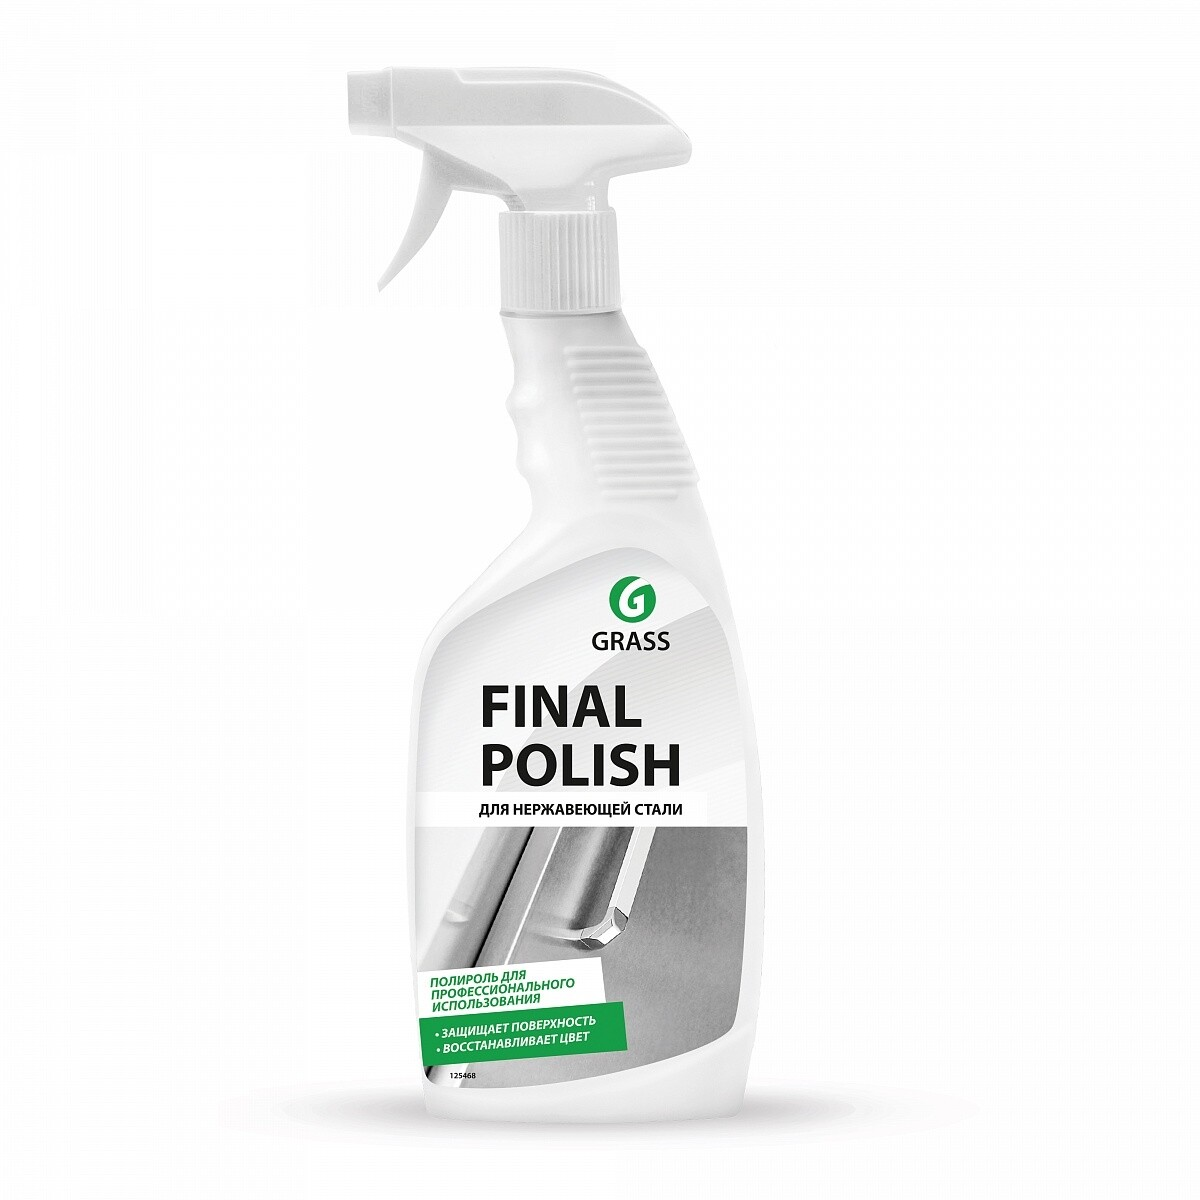 Stainless steel polish Final polish, 600 ml